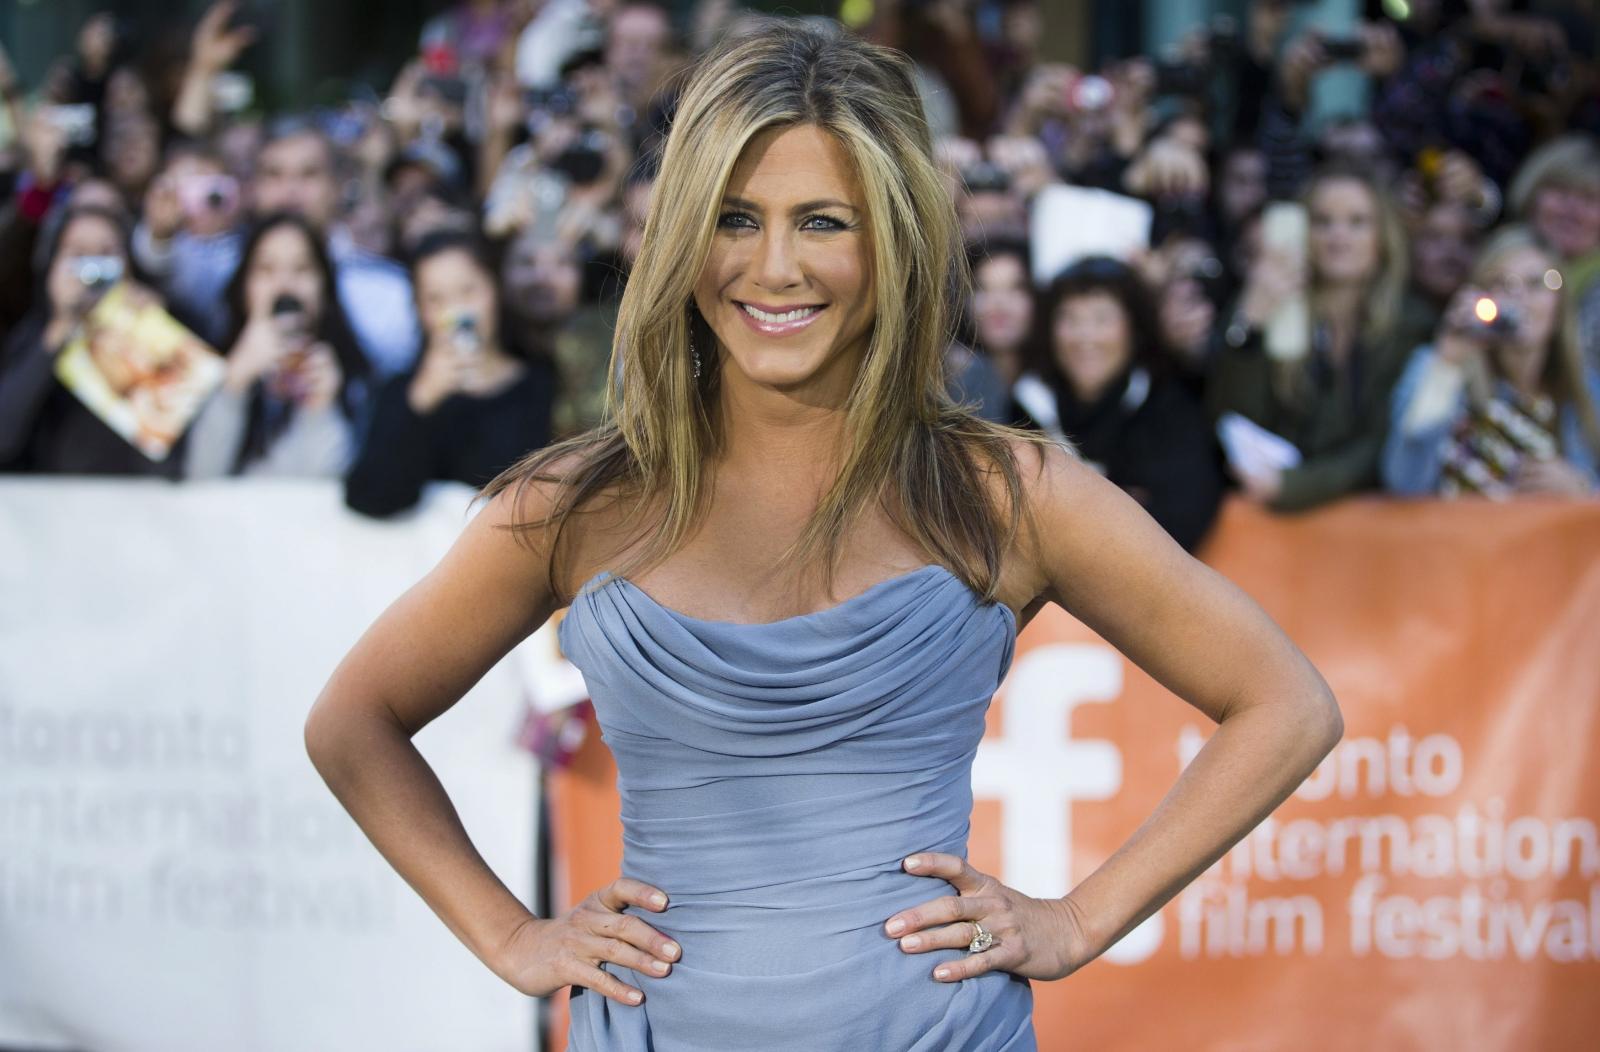 Jennifer Aniston hits out at media bodyshaming of female stars